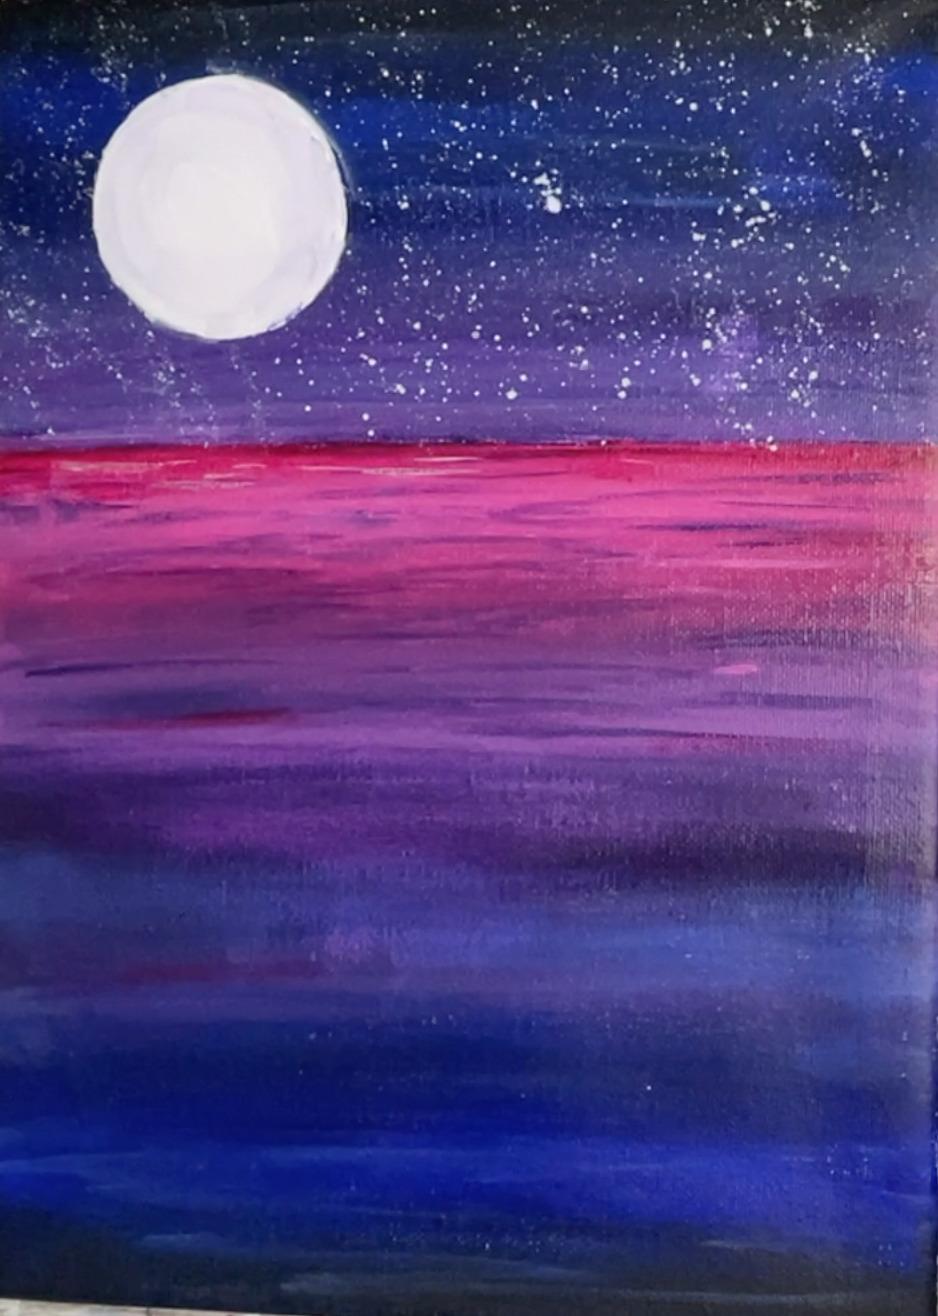 mermaid painting moon